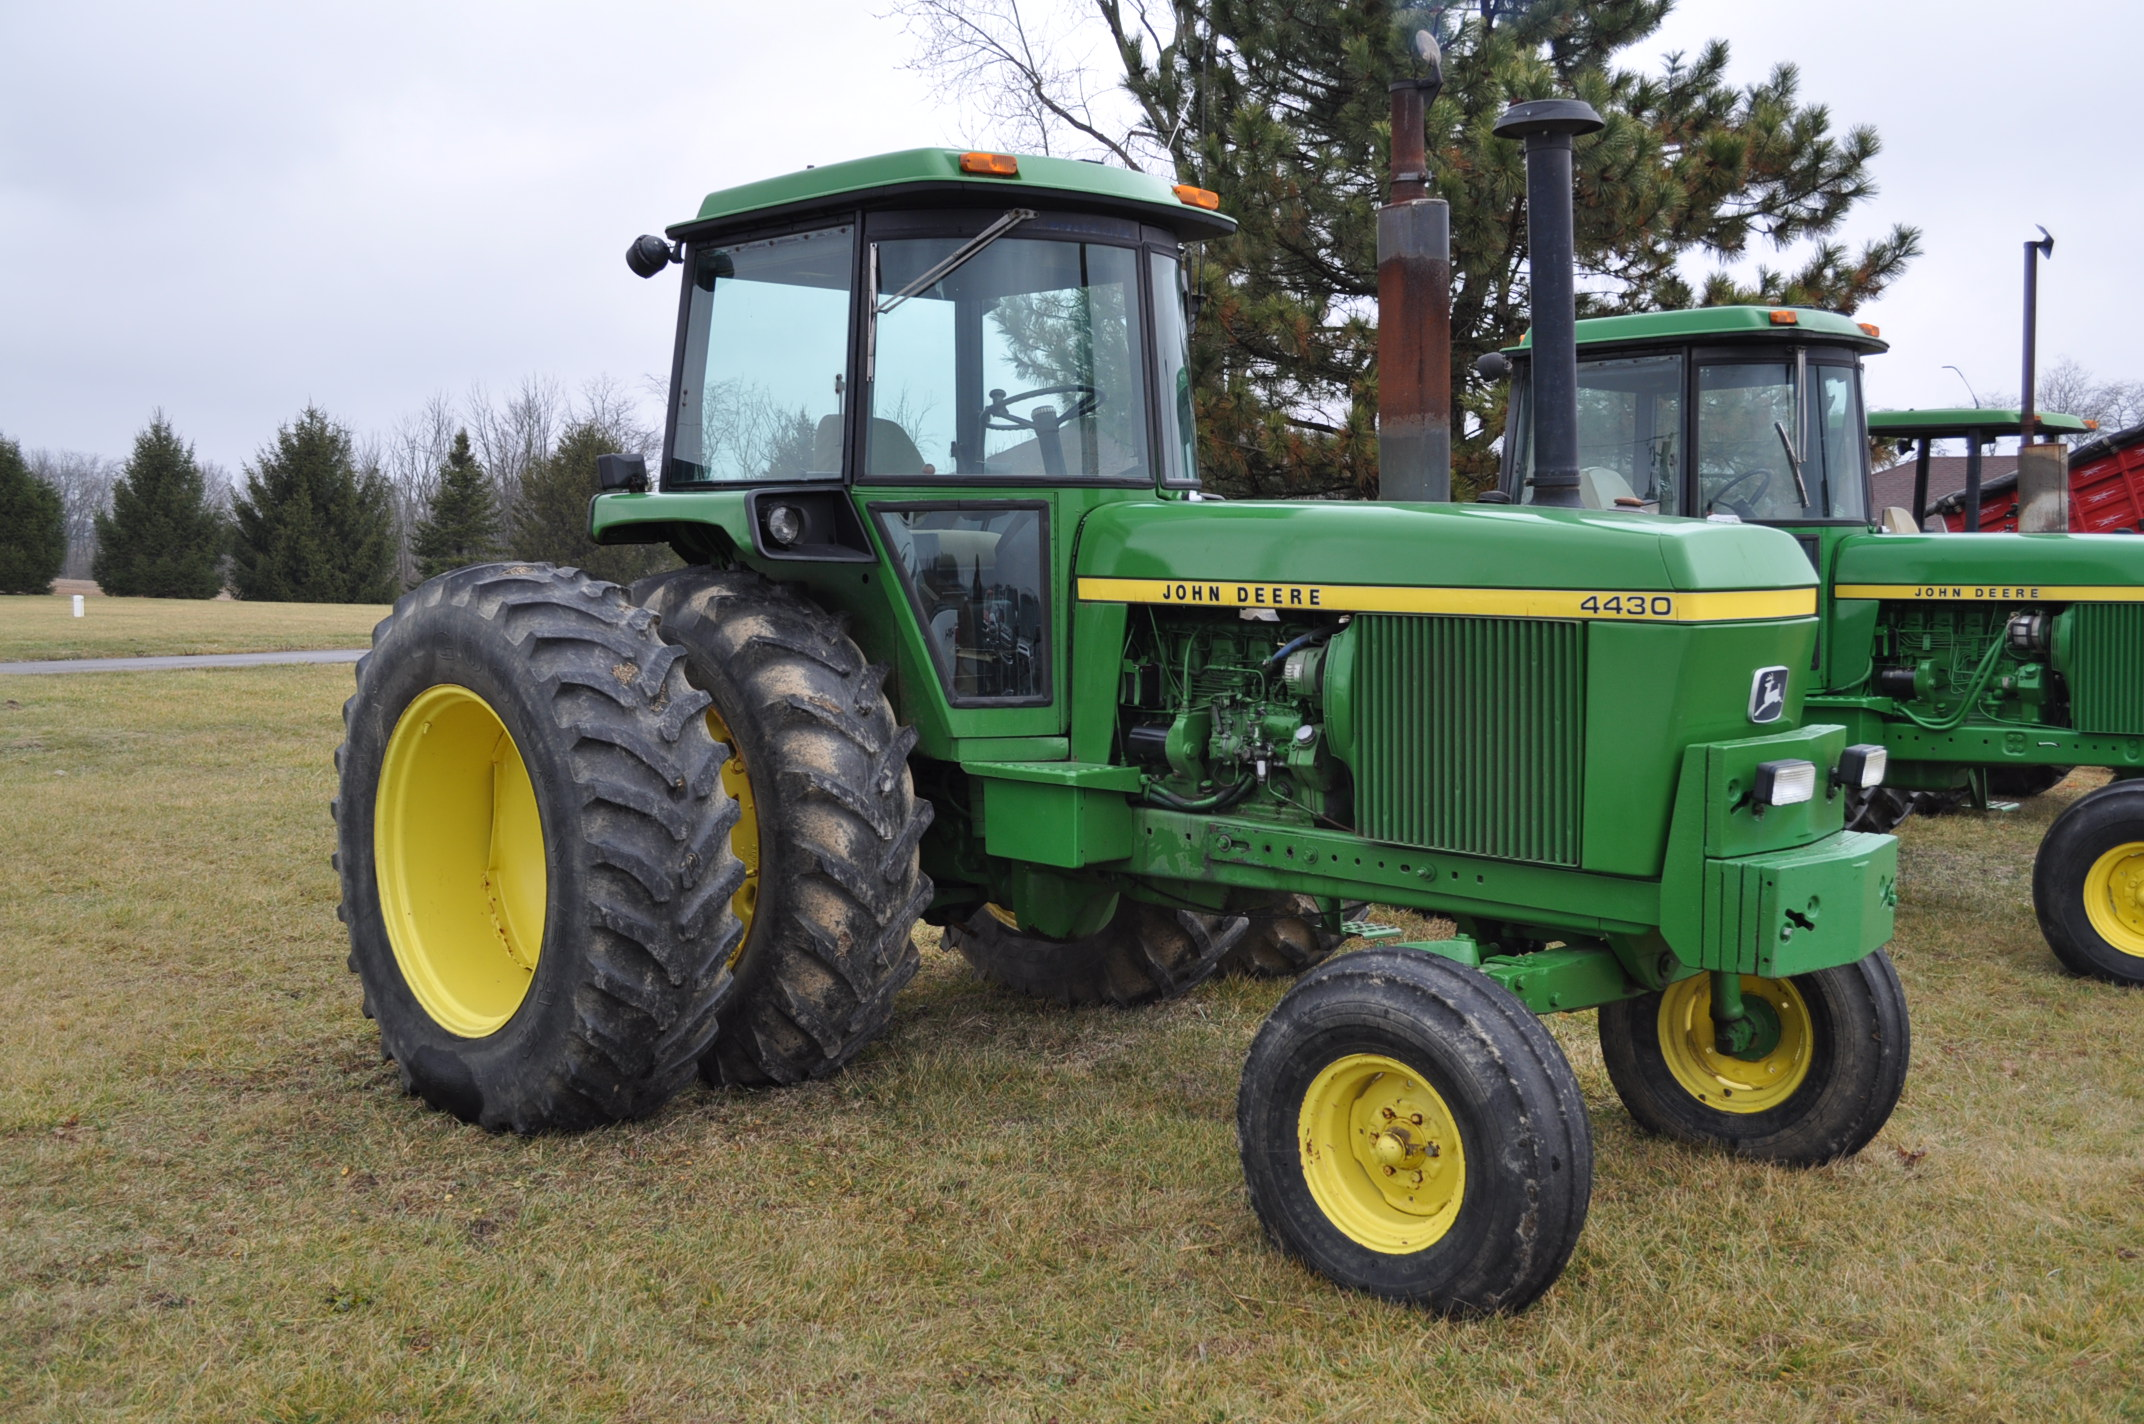 John Deere 4430 tractor, diesel, 18.4-34 hub duals, 10.00-16 front, CHA, Quad range, 2 hyd - Image 4 of 20